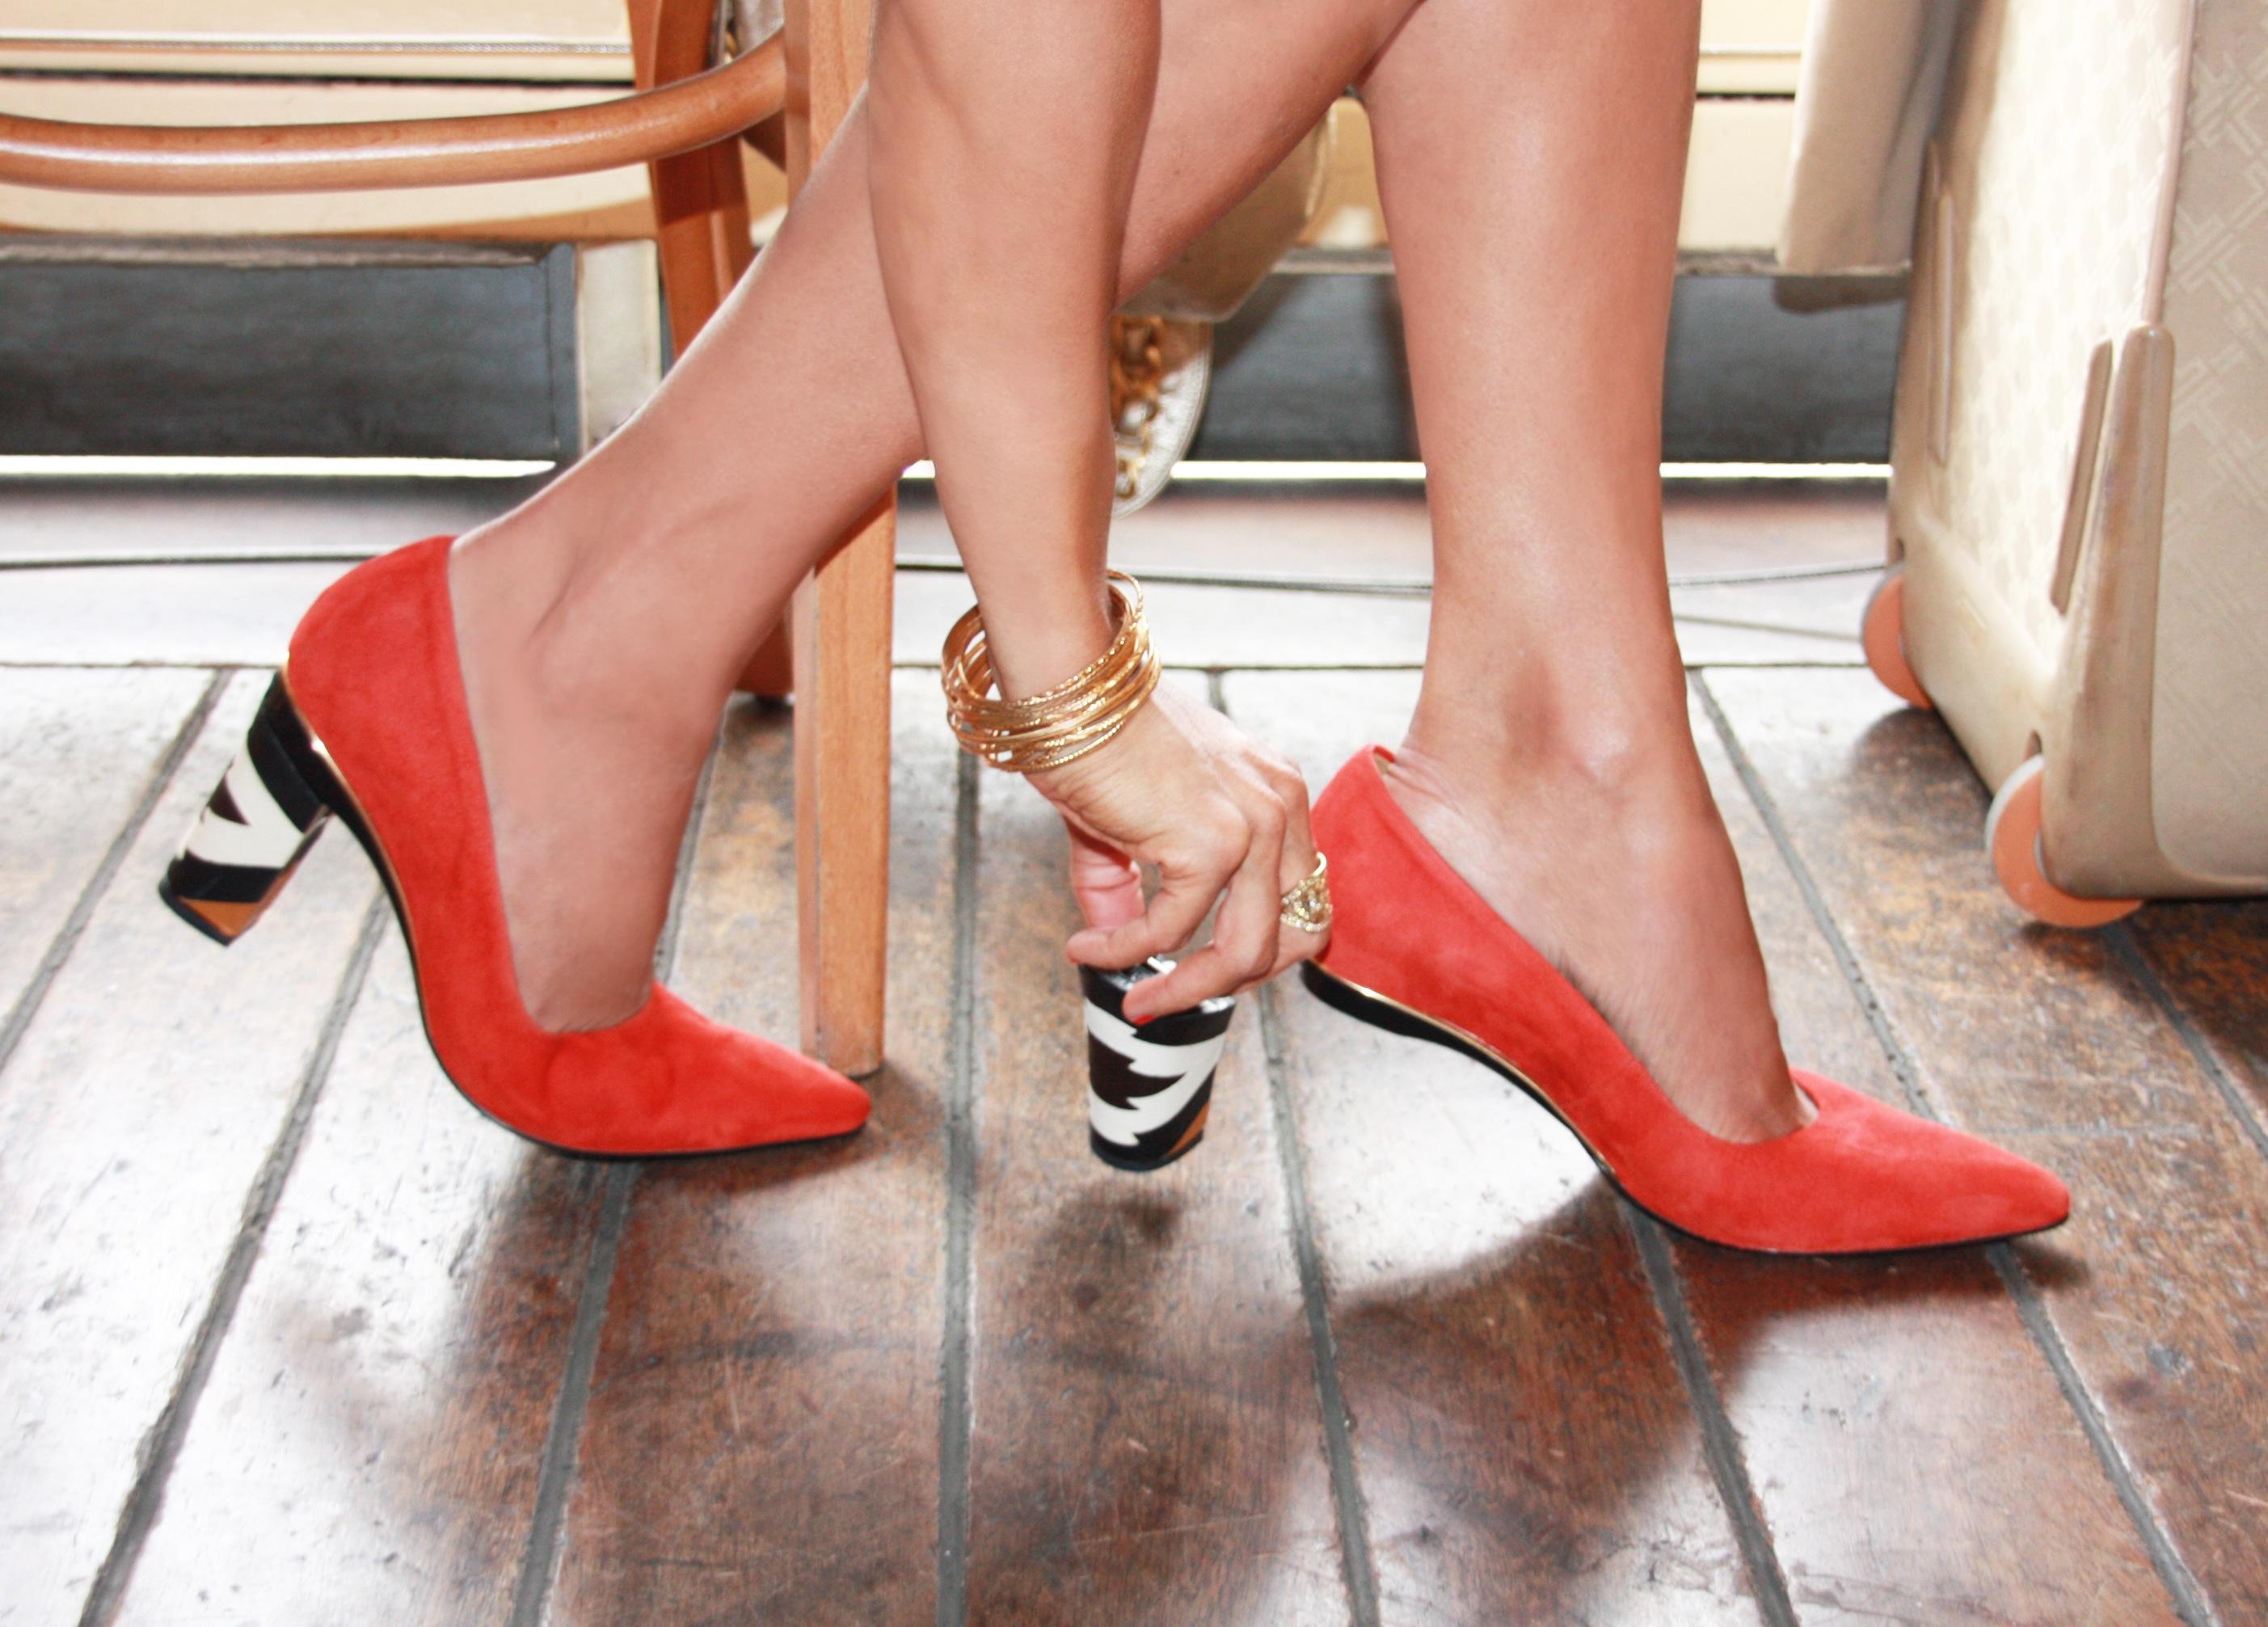 a5cefca89 Changement de talon ss n. Os sapatos que trocam ...